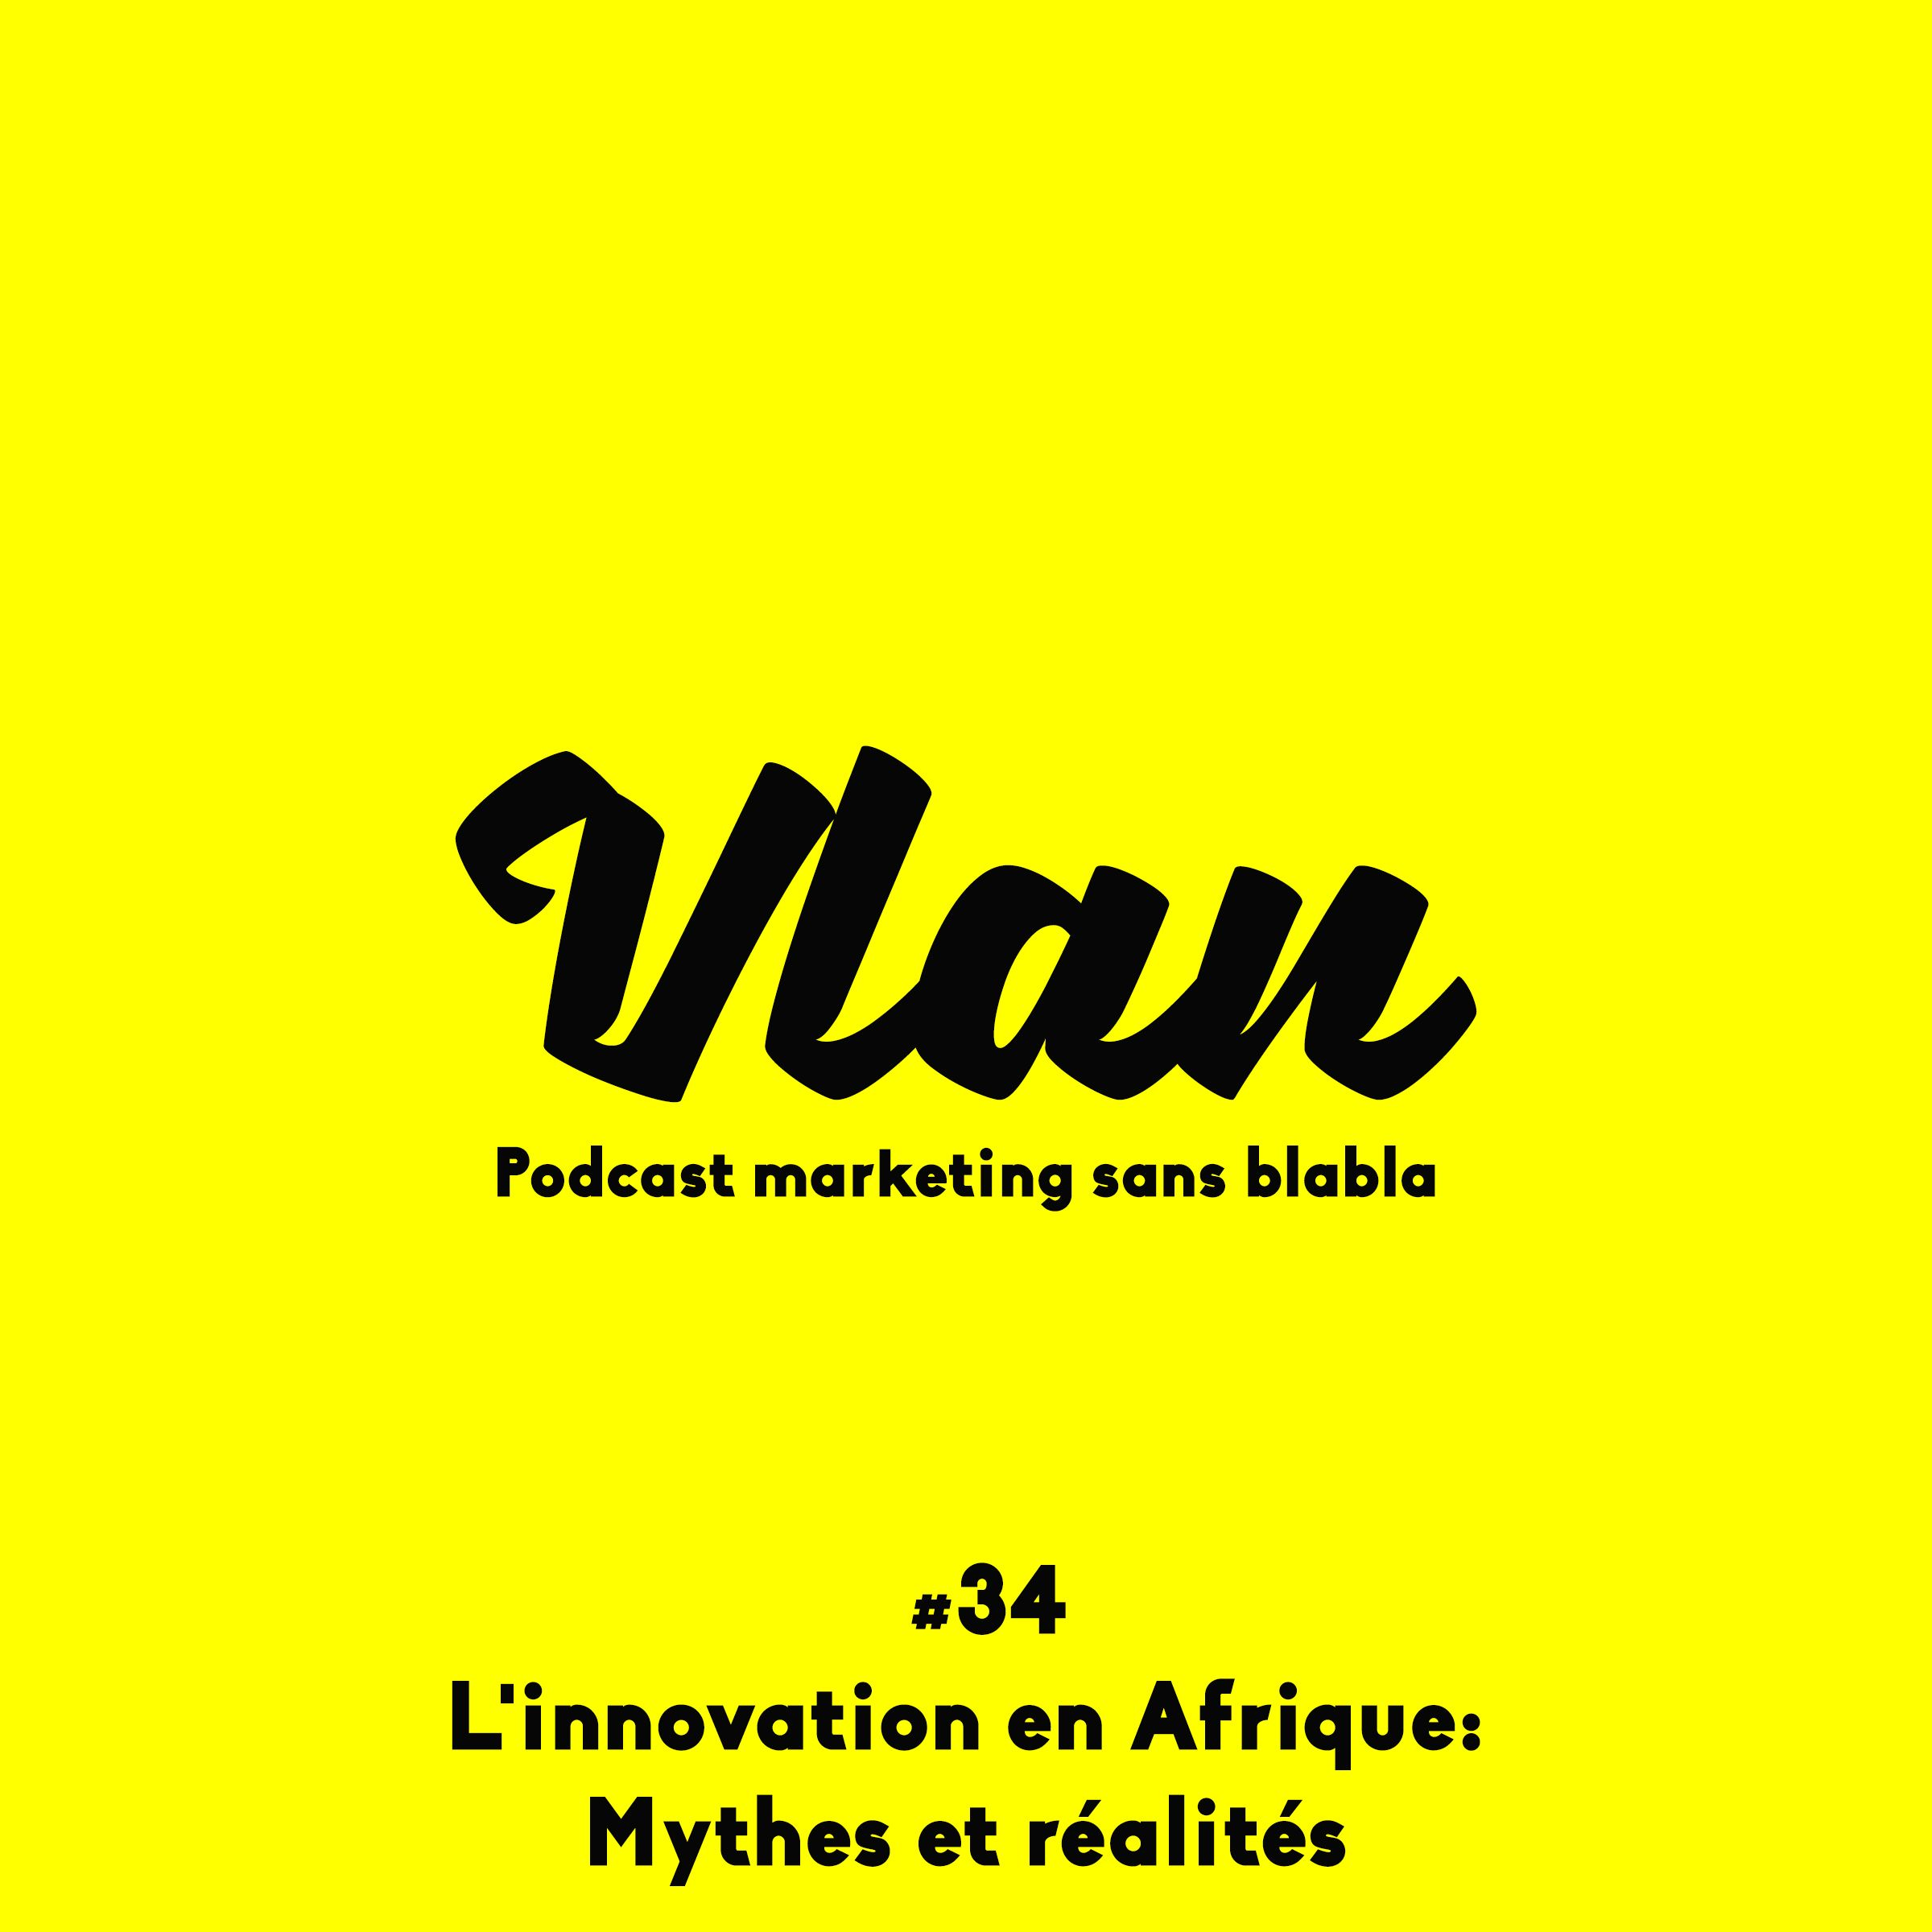 Vlan #34 Innovation en Afrique: mythes et réalités